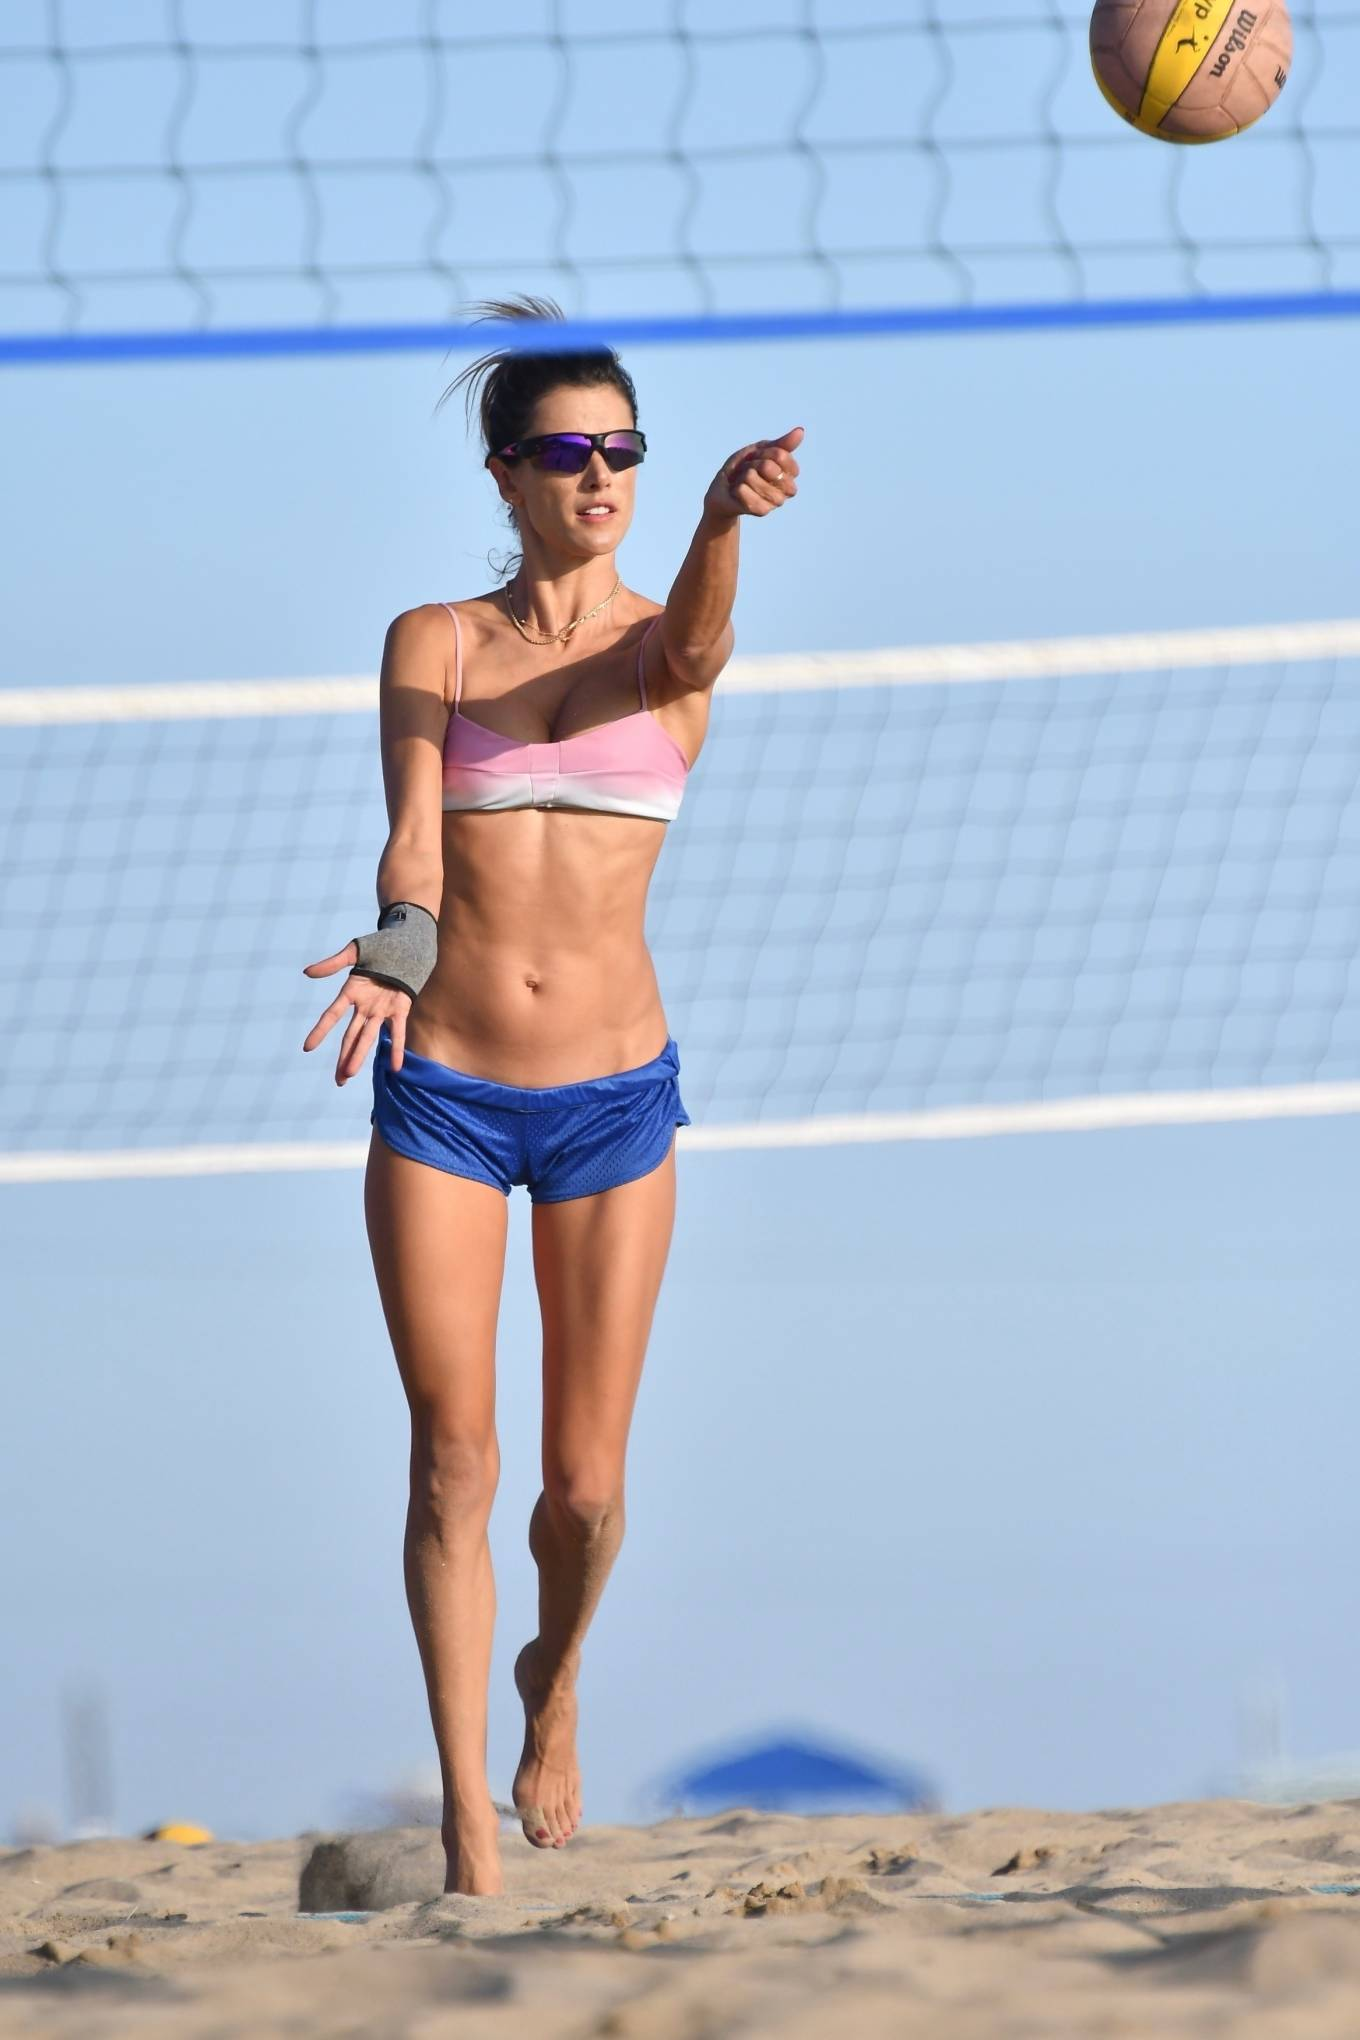 Alessandra Ambrosio - In a bikini playing volleyball on the beach in Santa Monica